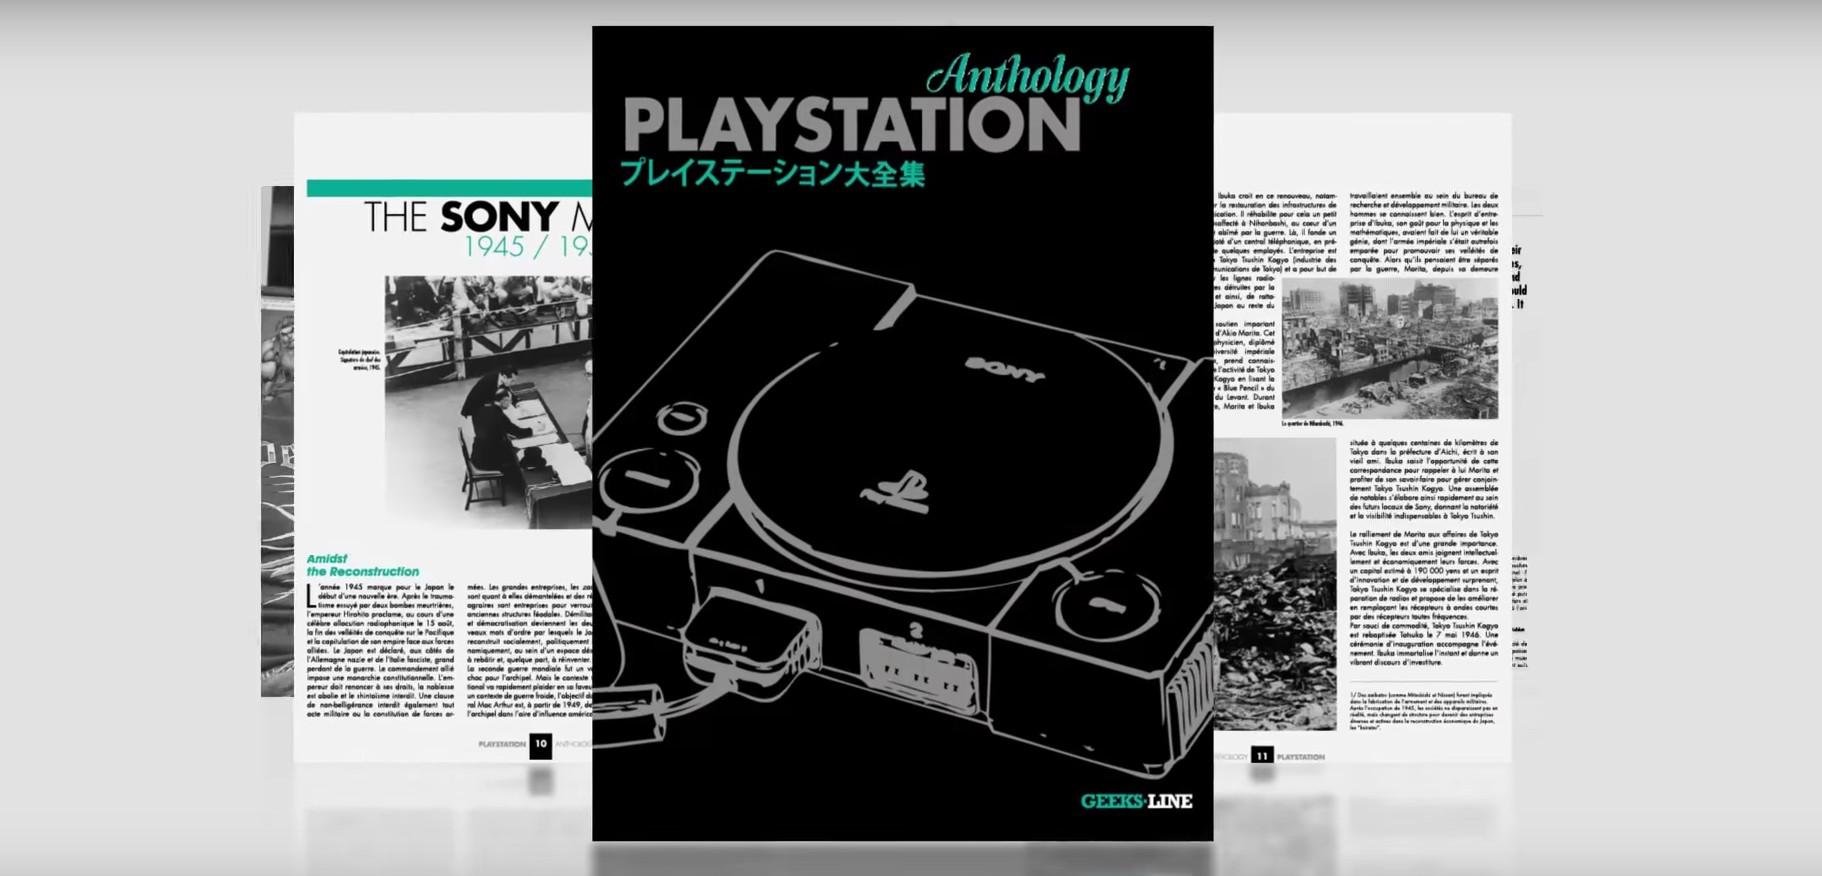 Die PlayStation Anthology stellt die erste Sony-Konsole ausgiebig vor. (Foto: Geeksline Publising)